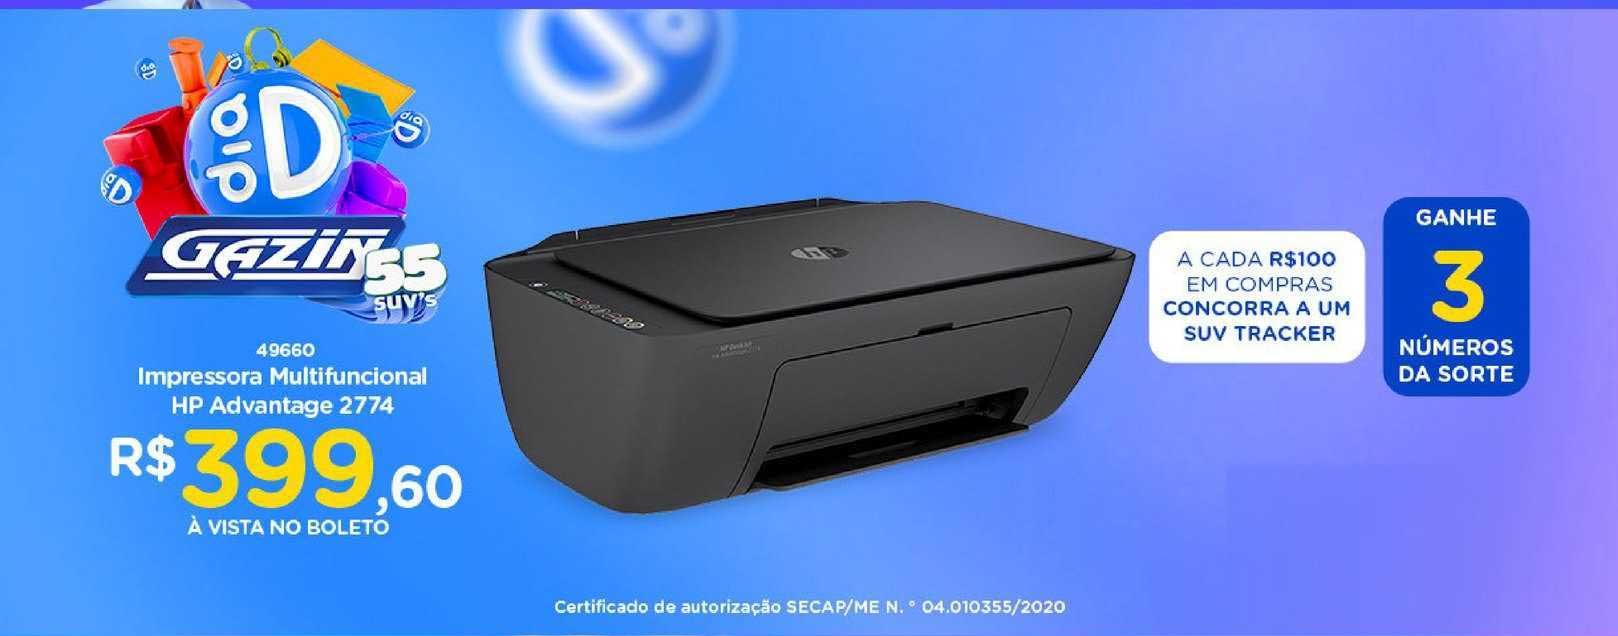 Gazin Impressora Multifuncional Hp Advantage 2774